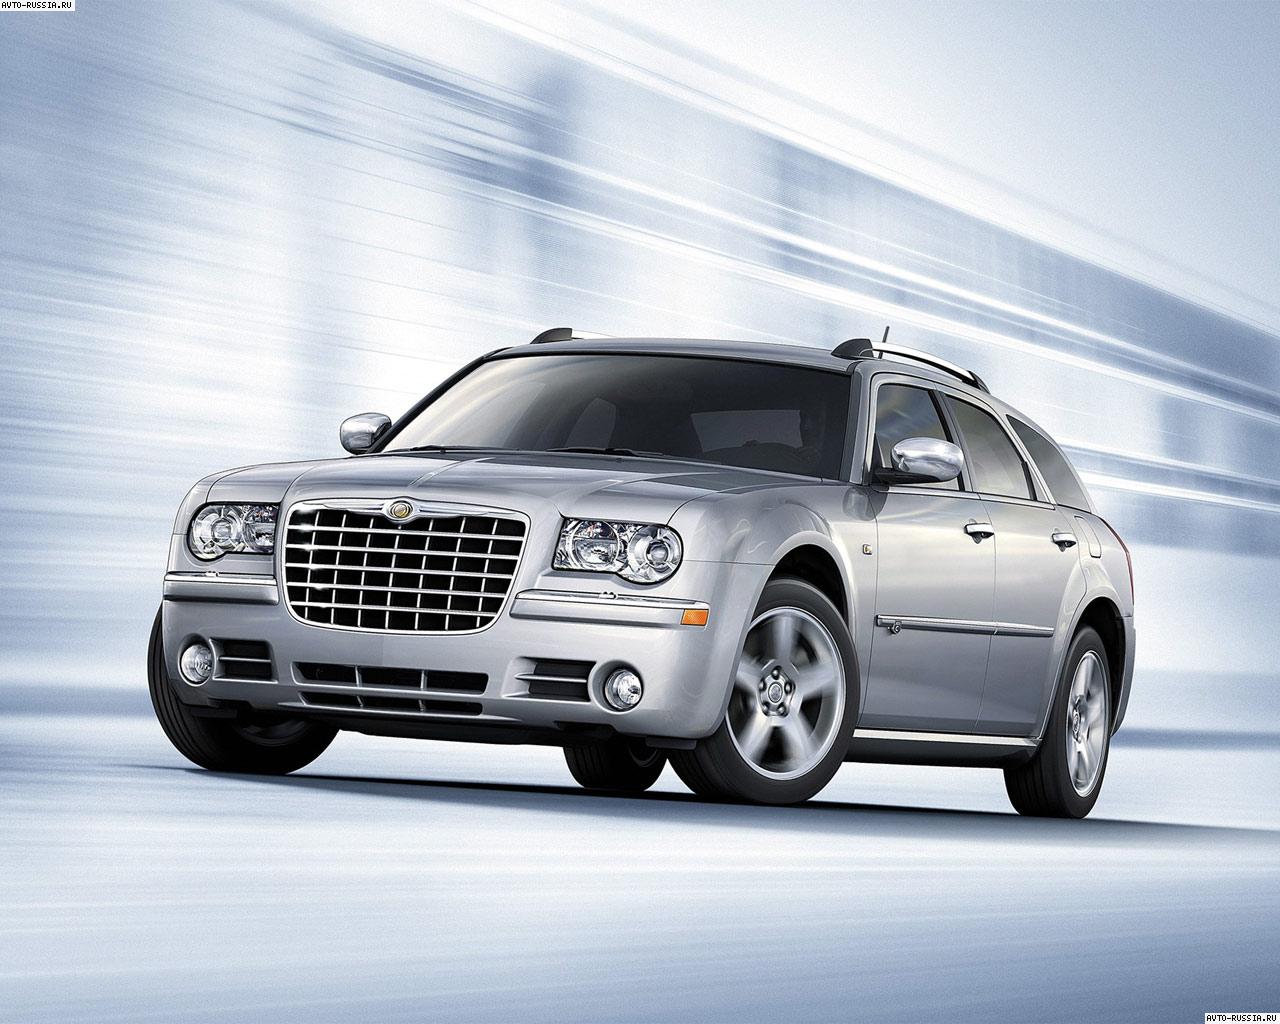 Chrysler 300c touring as a tow car #2